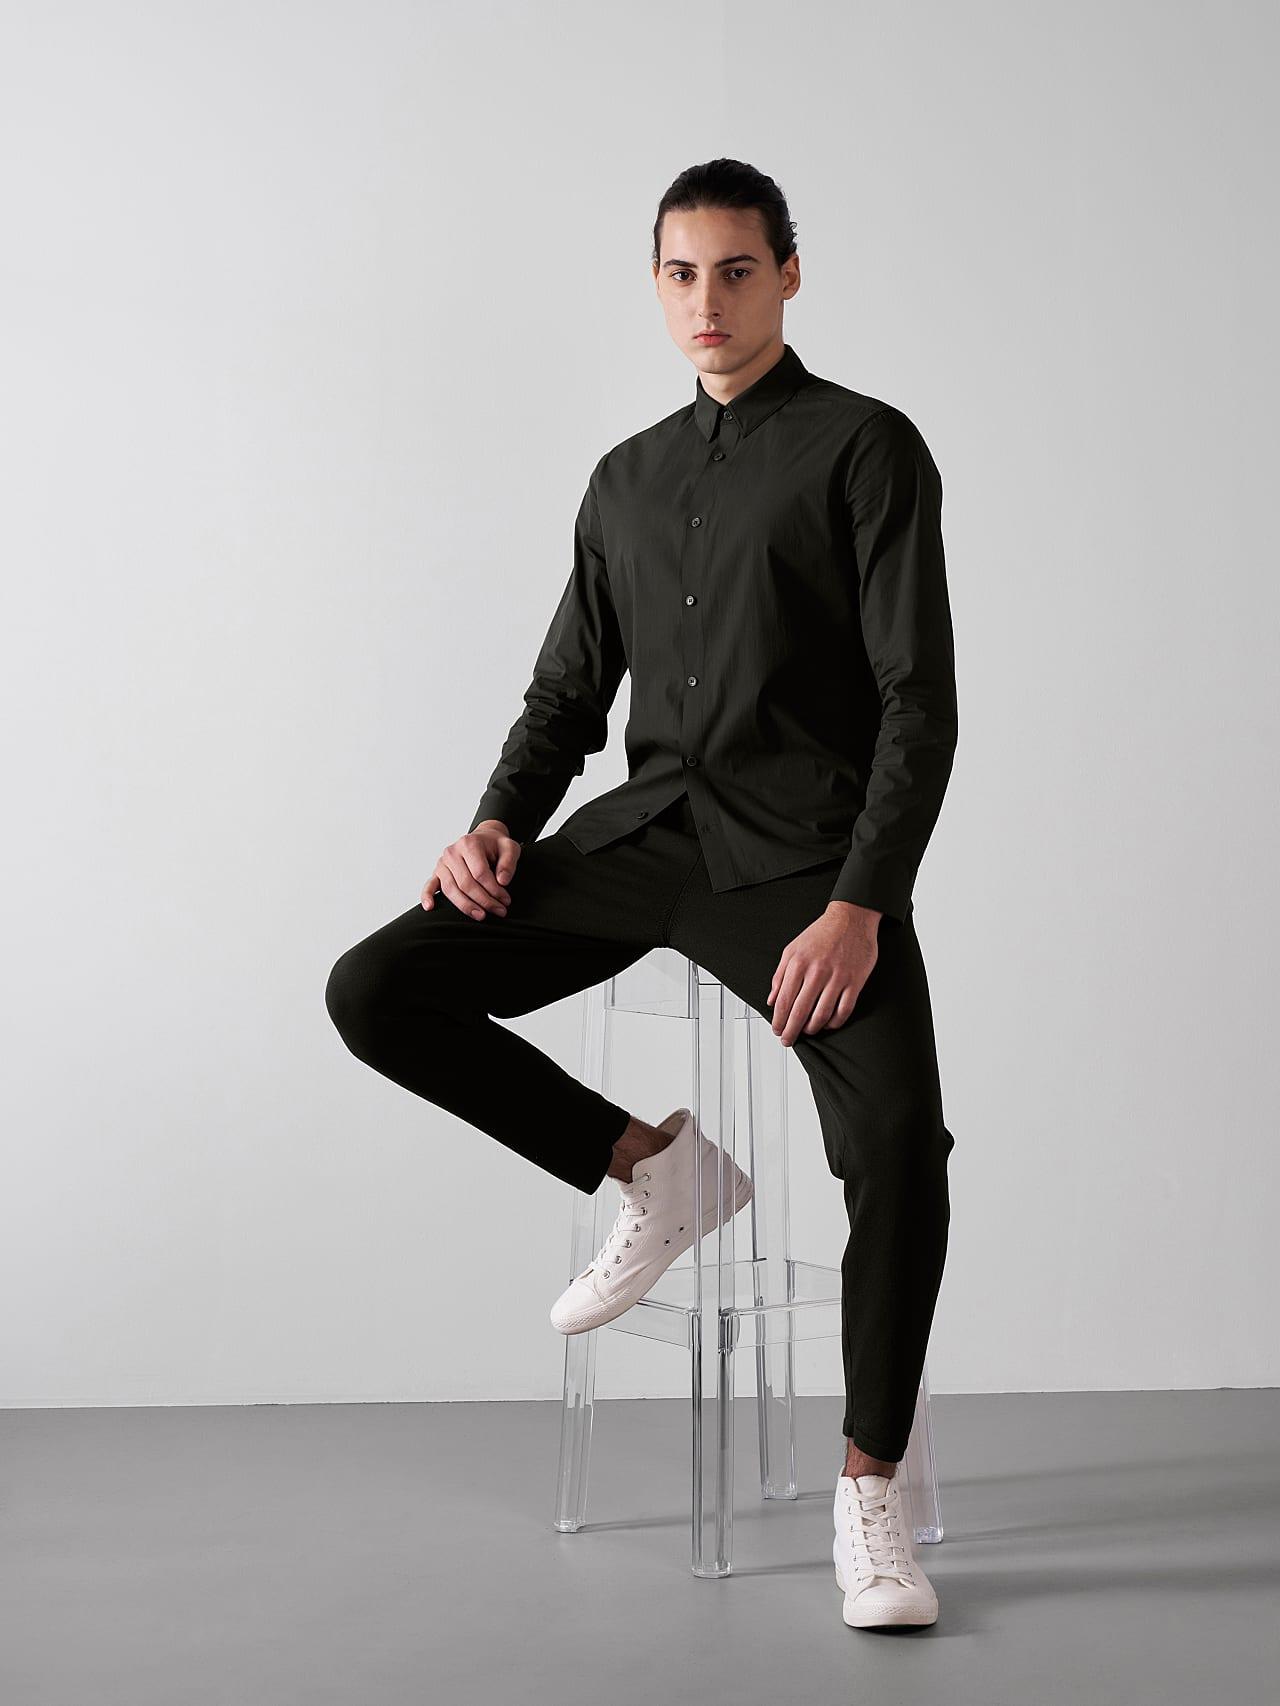 WAARG V1.Y5.01 Cotton-Stretch Shirt olive Front Alpha Tauri